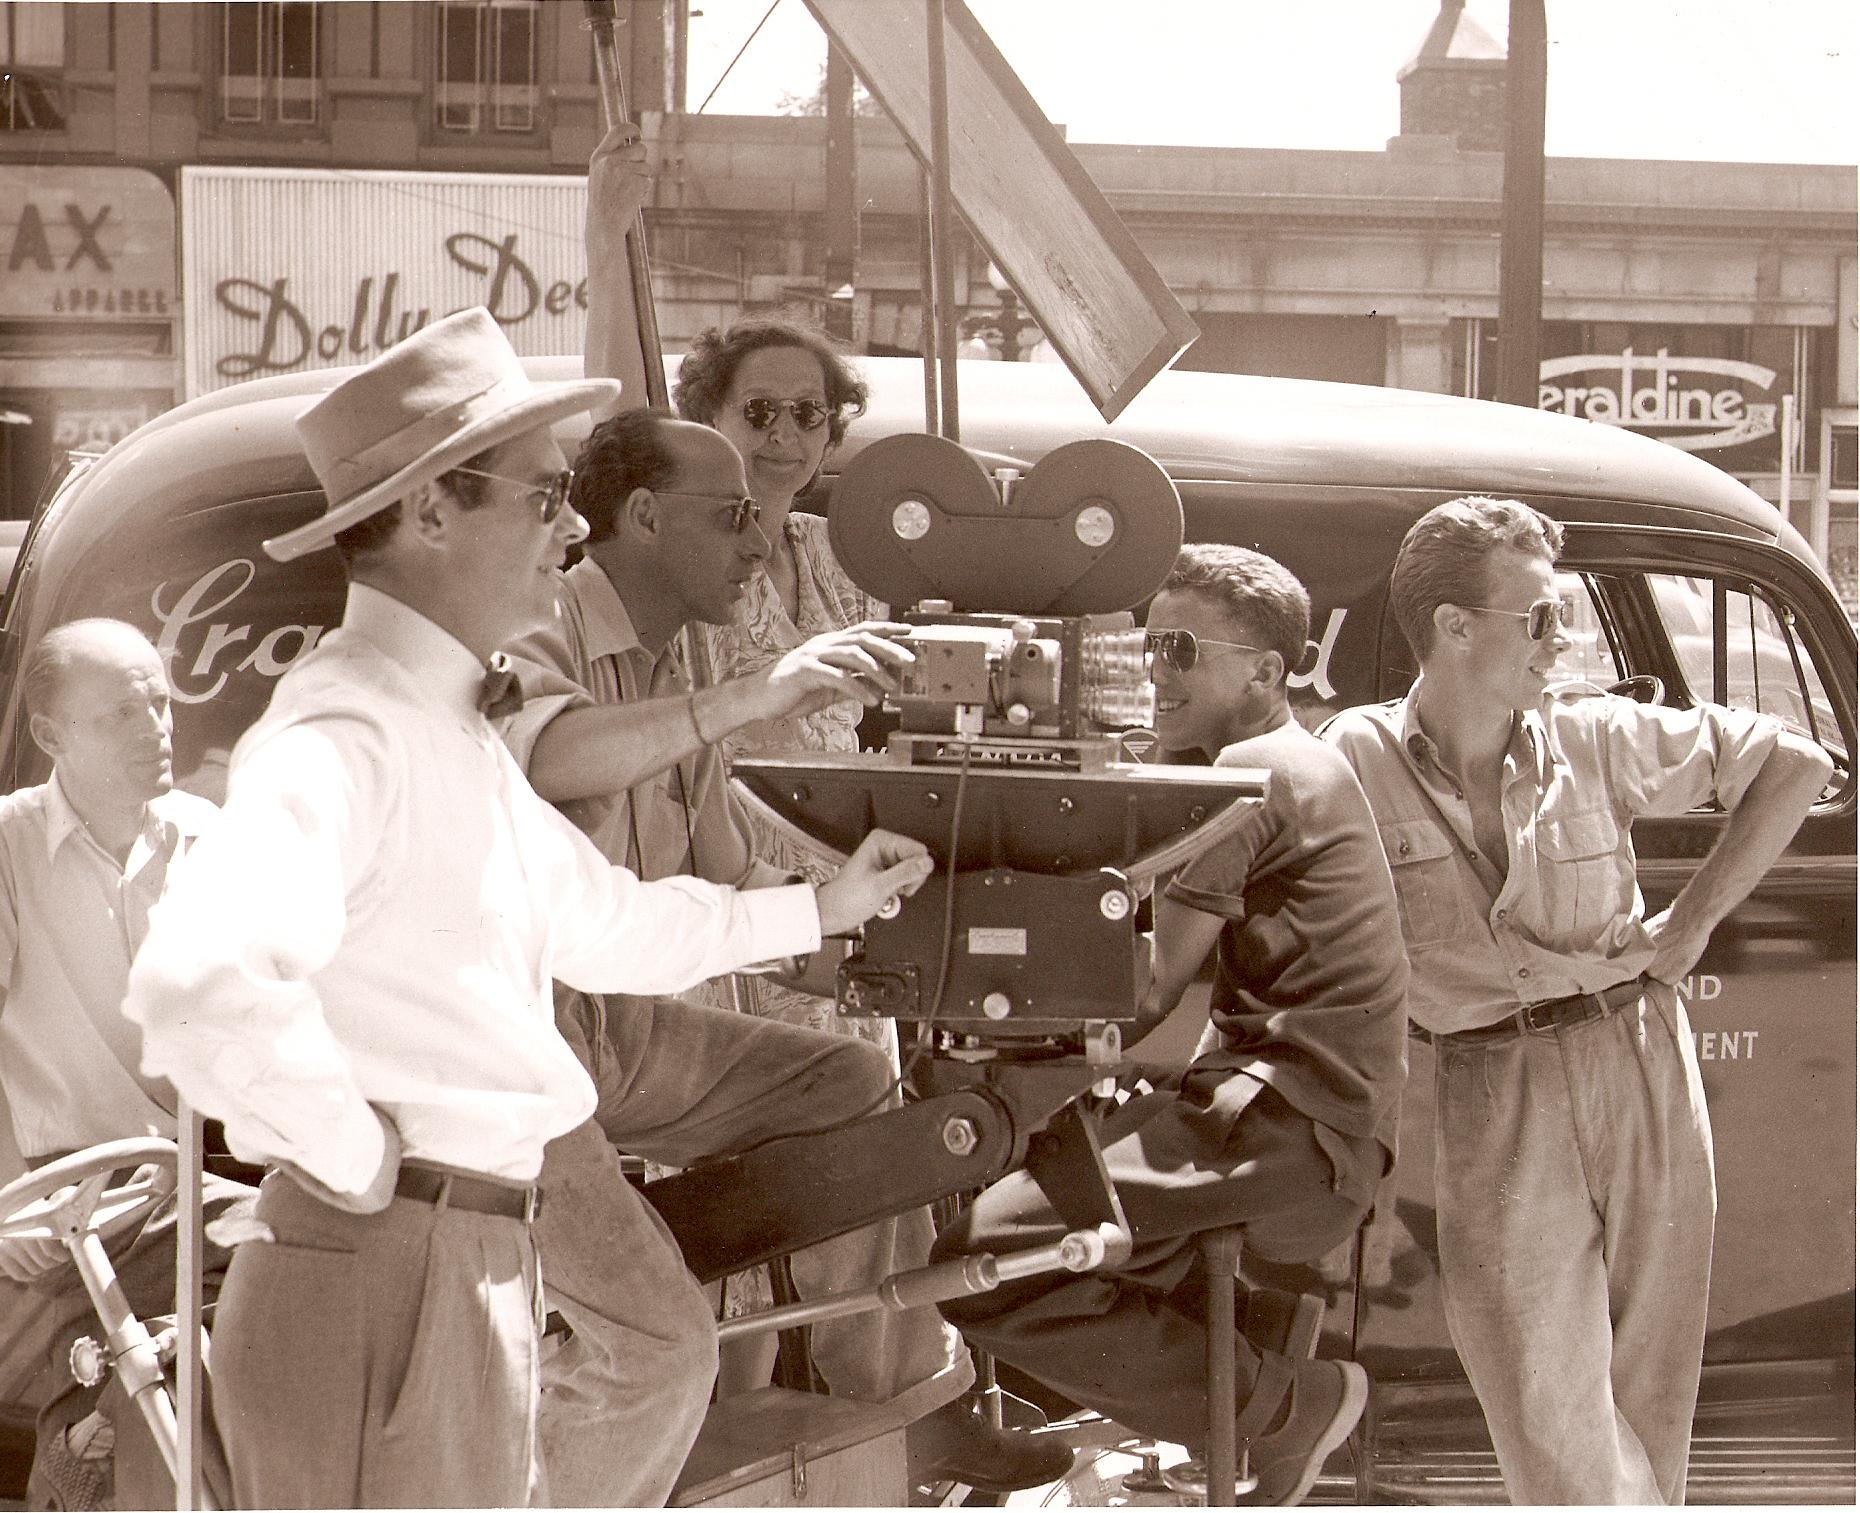 Film industry.